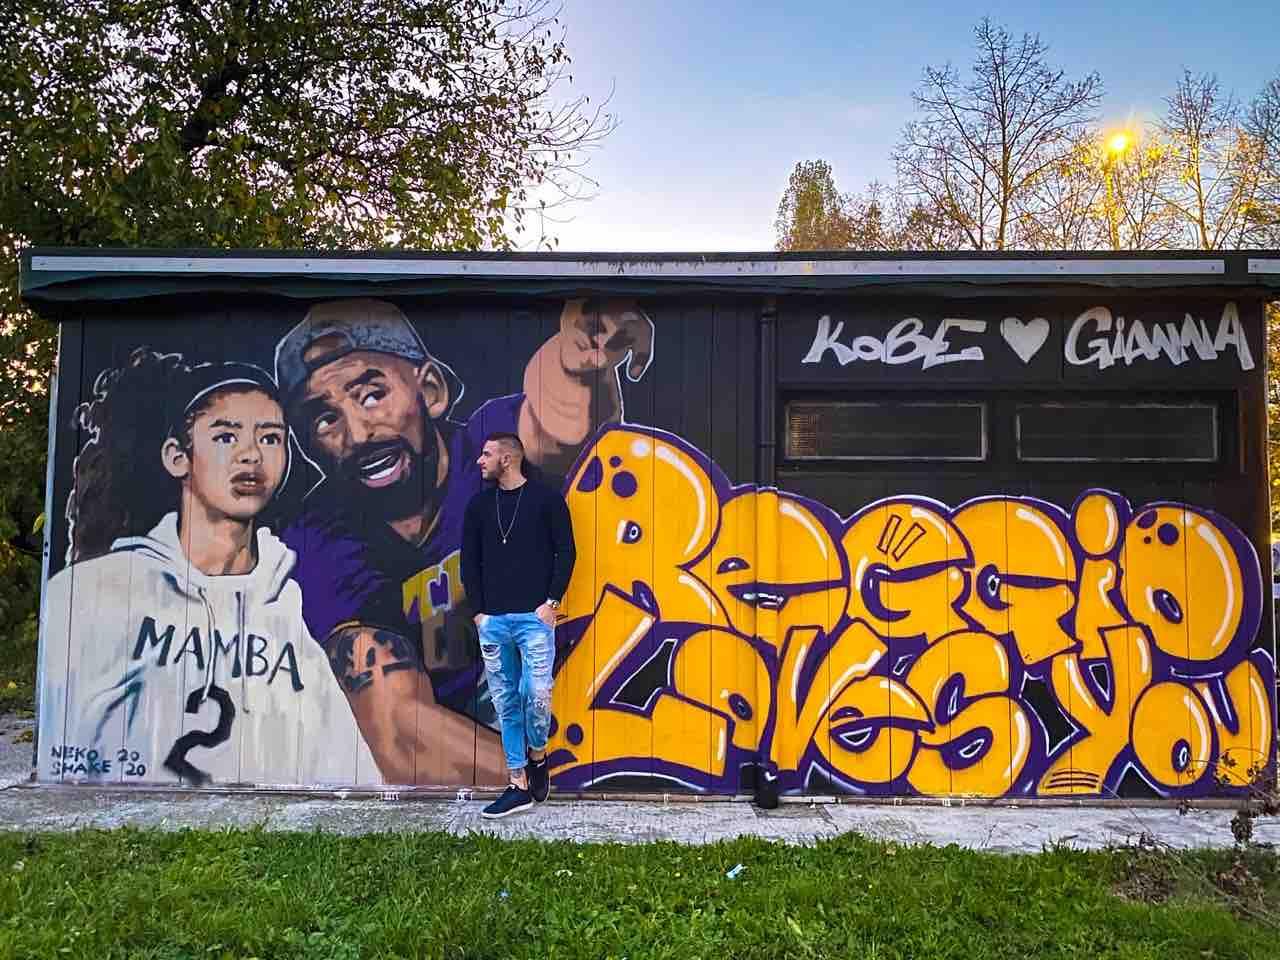 Murales di Reggio Emilia Kobe e Gianna Bryant